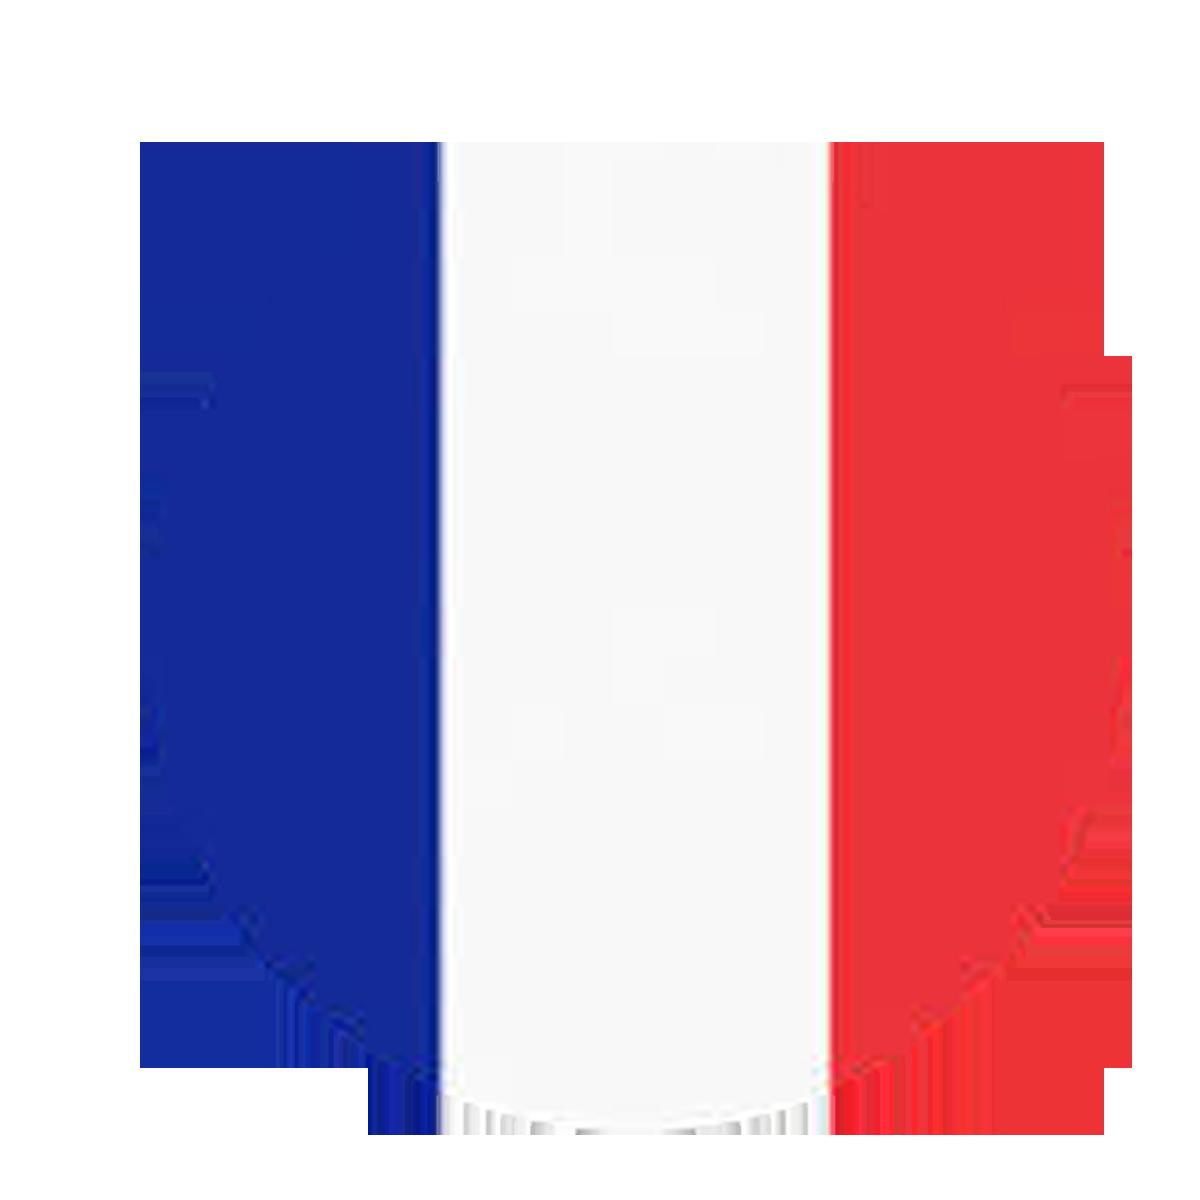 affaire bébé - fabrication française